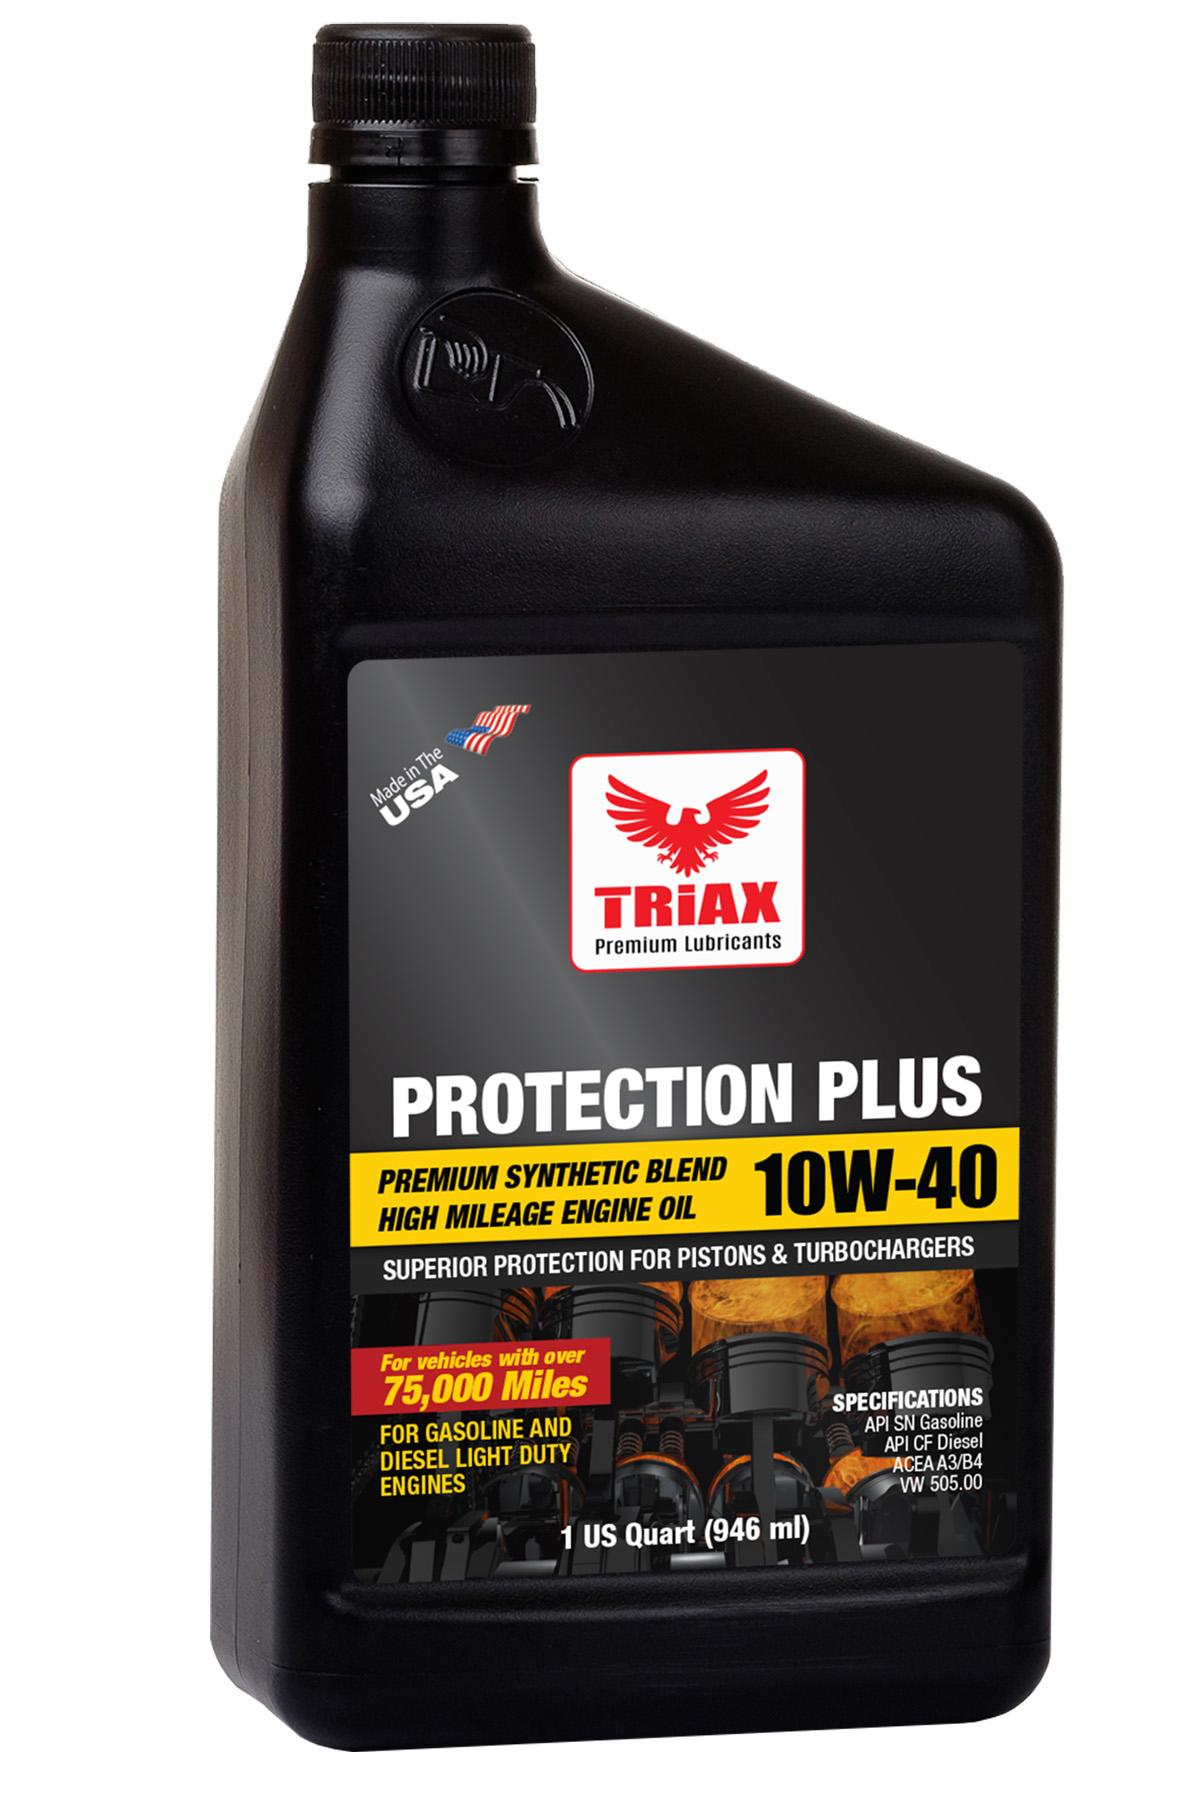 TRIAX Protection Plus 10W-40 High Mileage